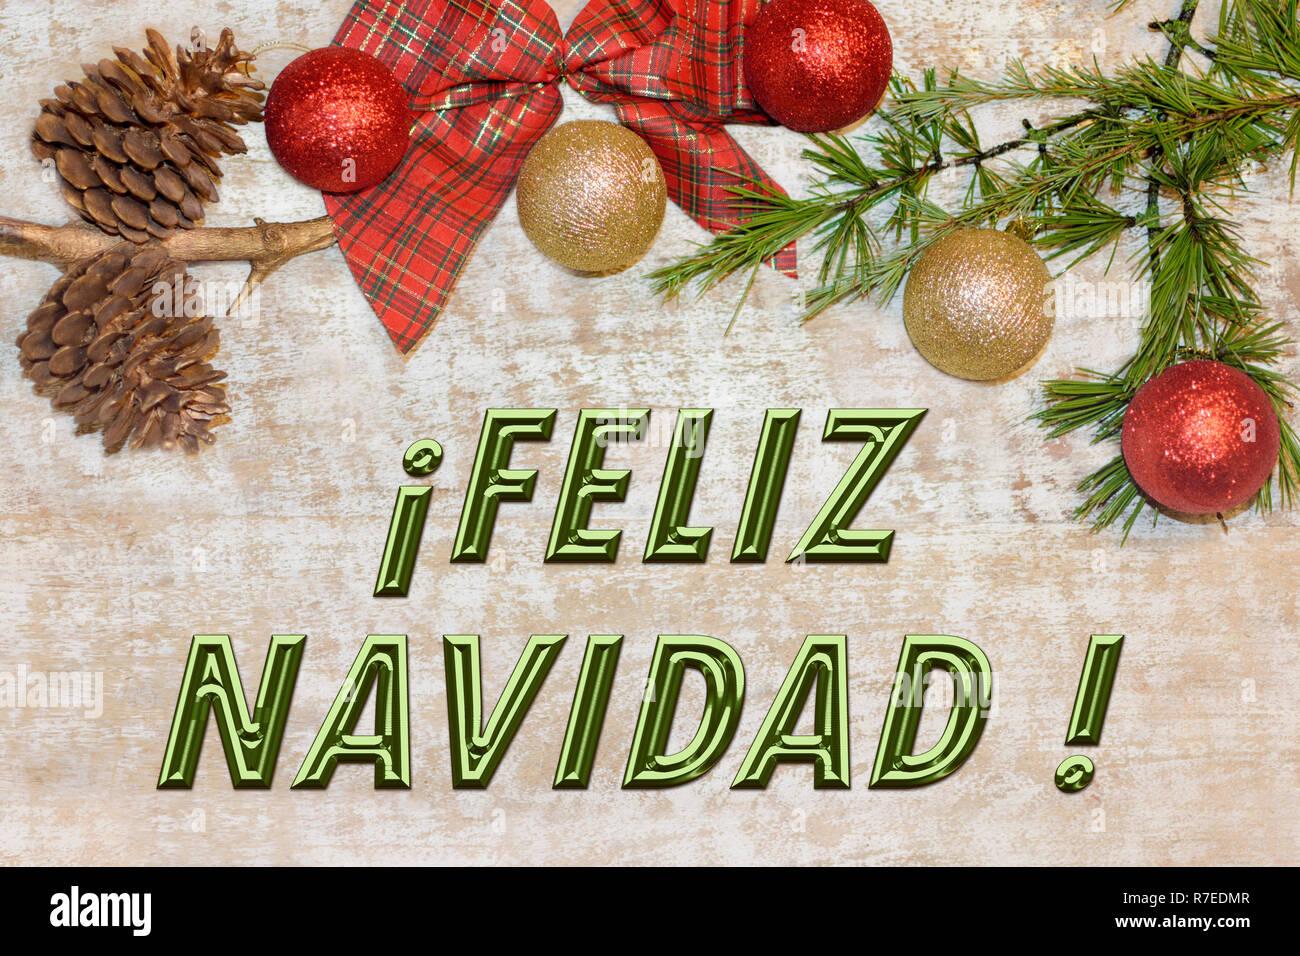 feliz navidad stock photos